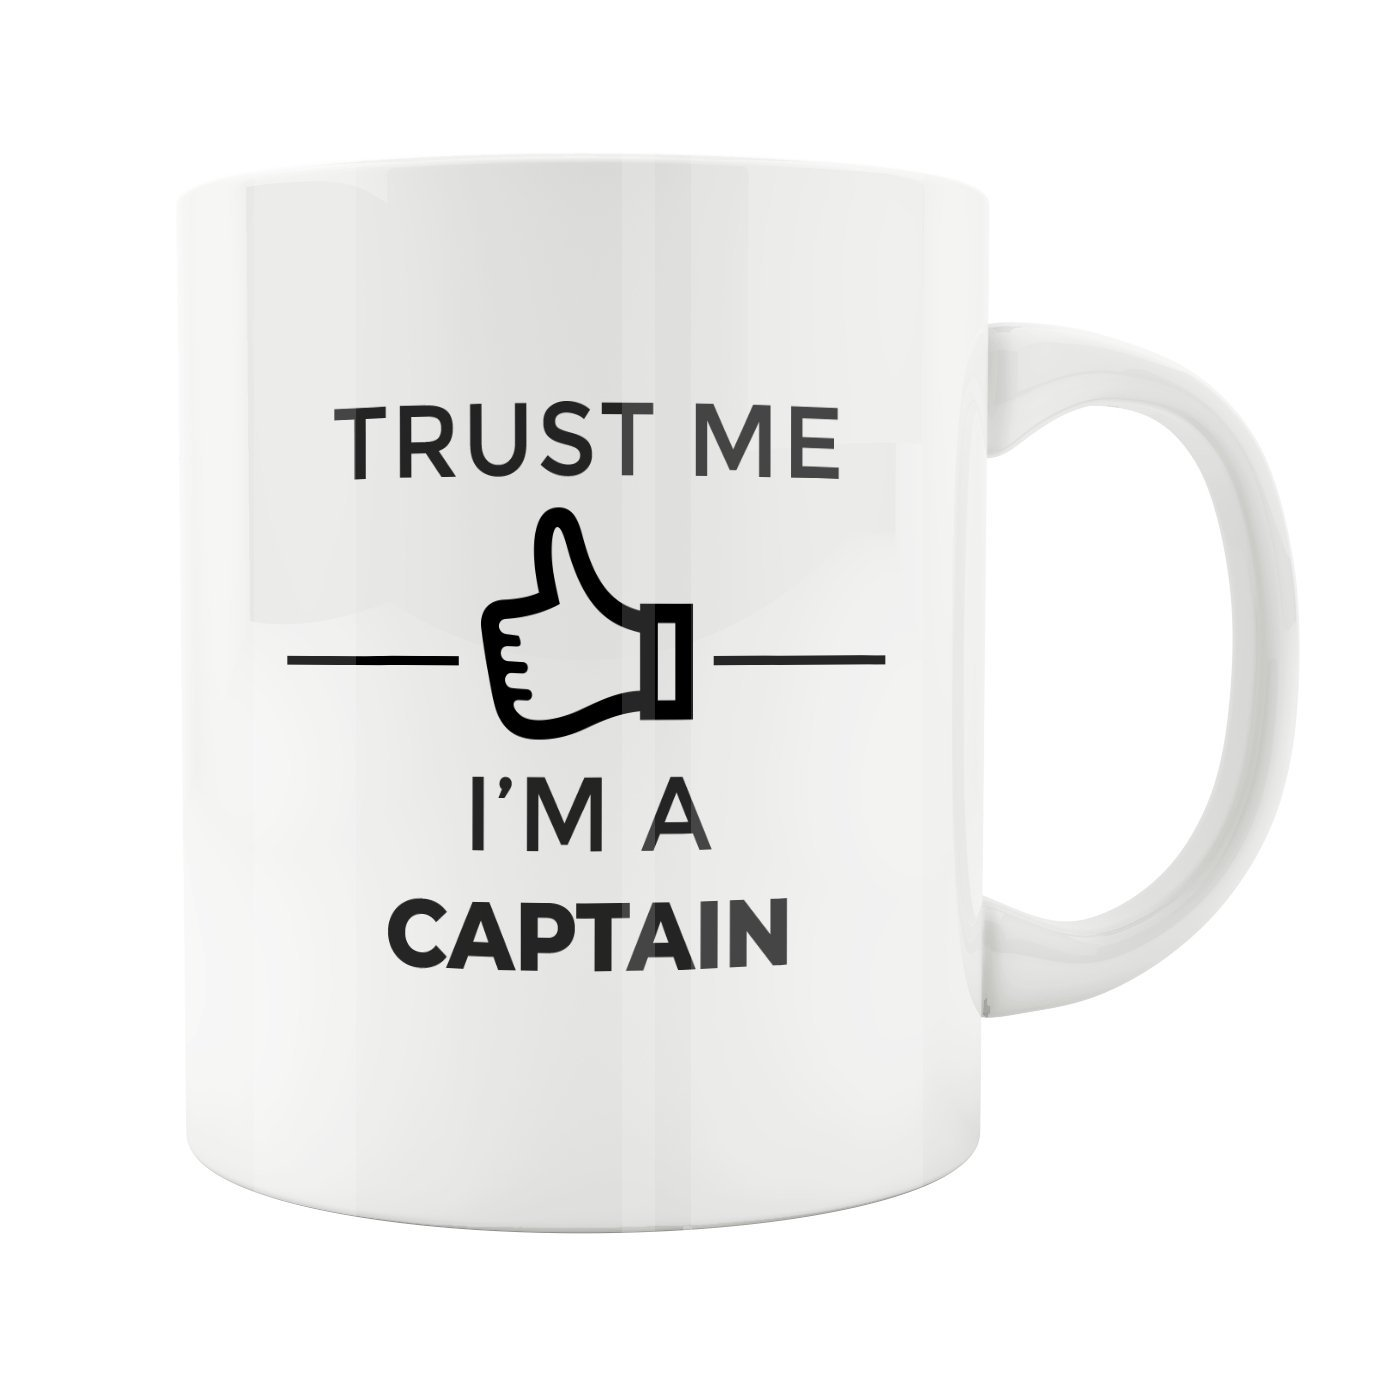 Captain Gifts Aircraft Aviation Captain Funny Coffee Mug Flight Attendant Flight Crew Airline Pilot Gift Navigator Pilot Airforce